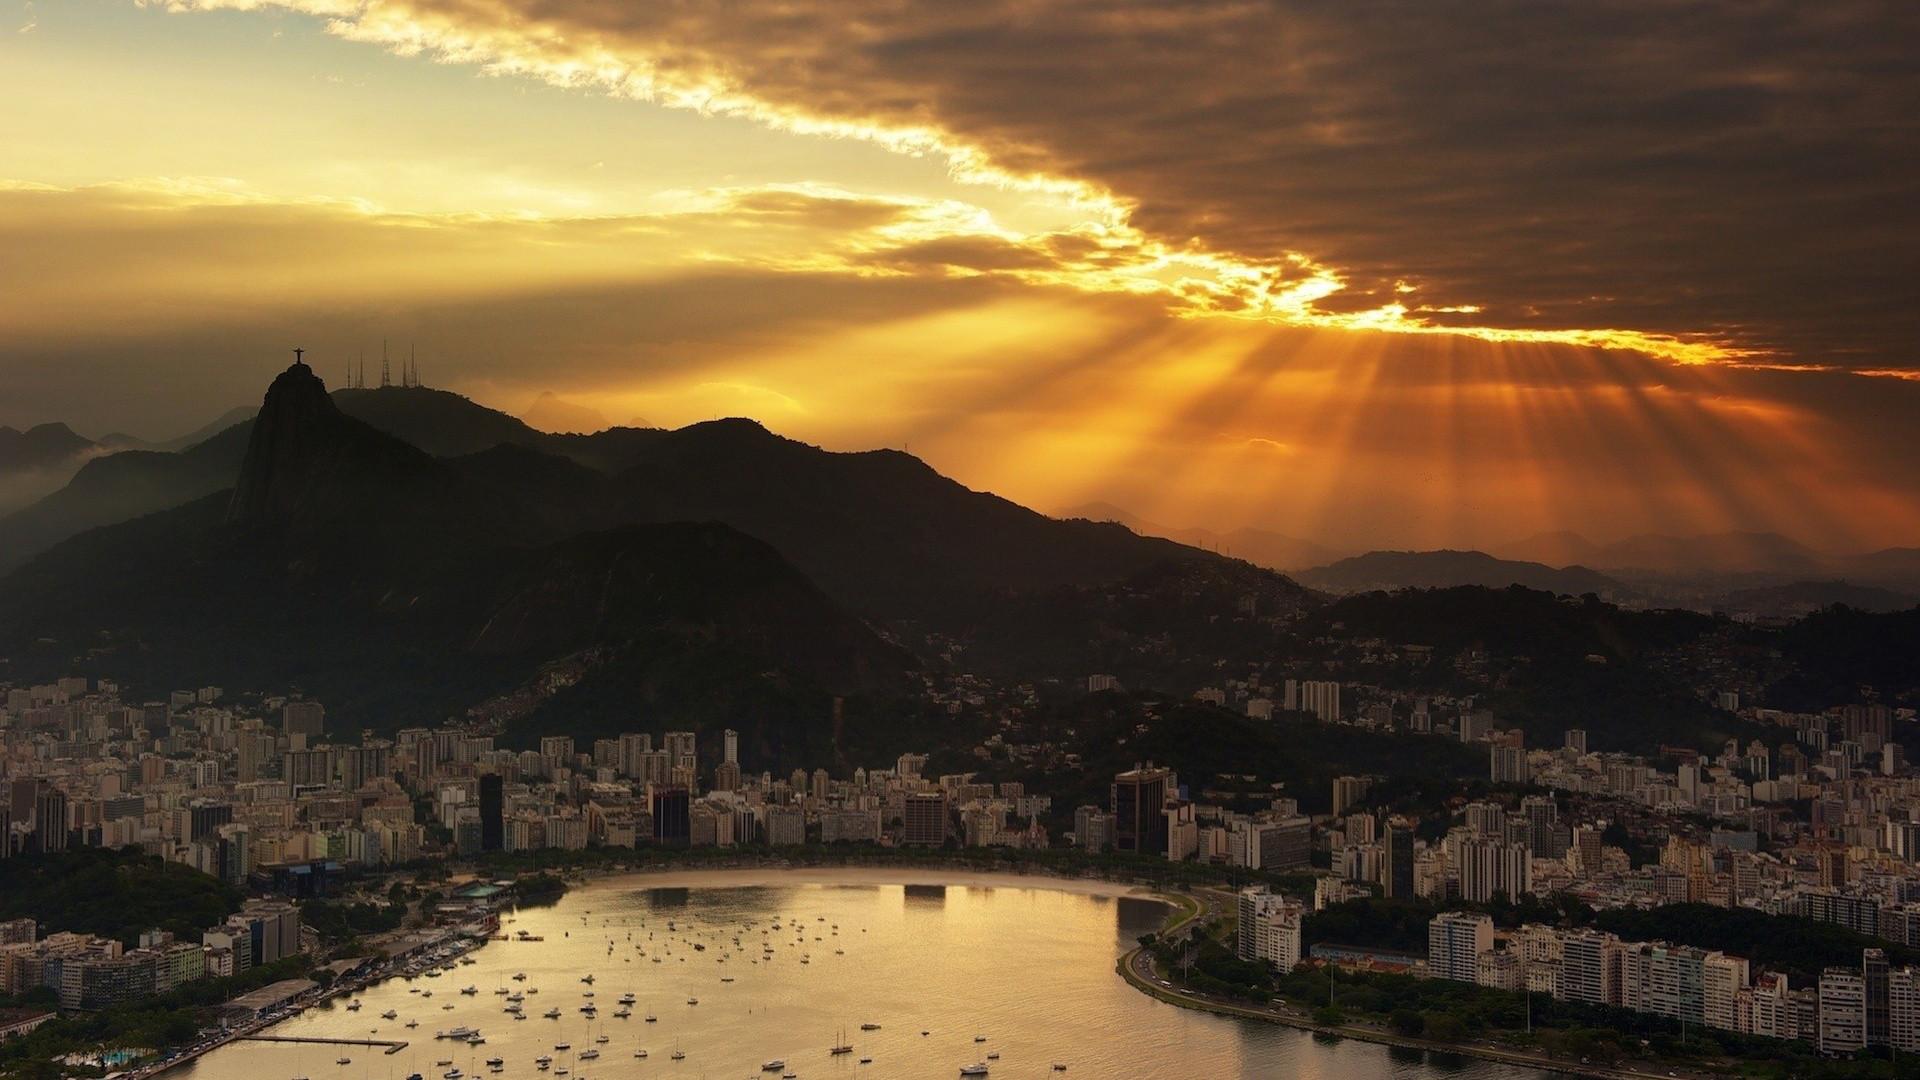 Beautiful Rio De Janeiro HD Desktop Panorama Widescreen Wallpaper with  1920×1080 High Resolution for